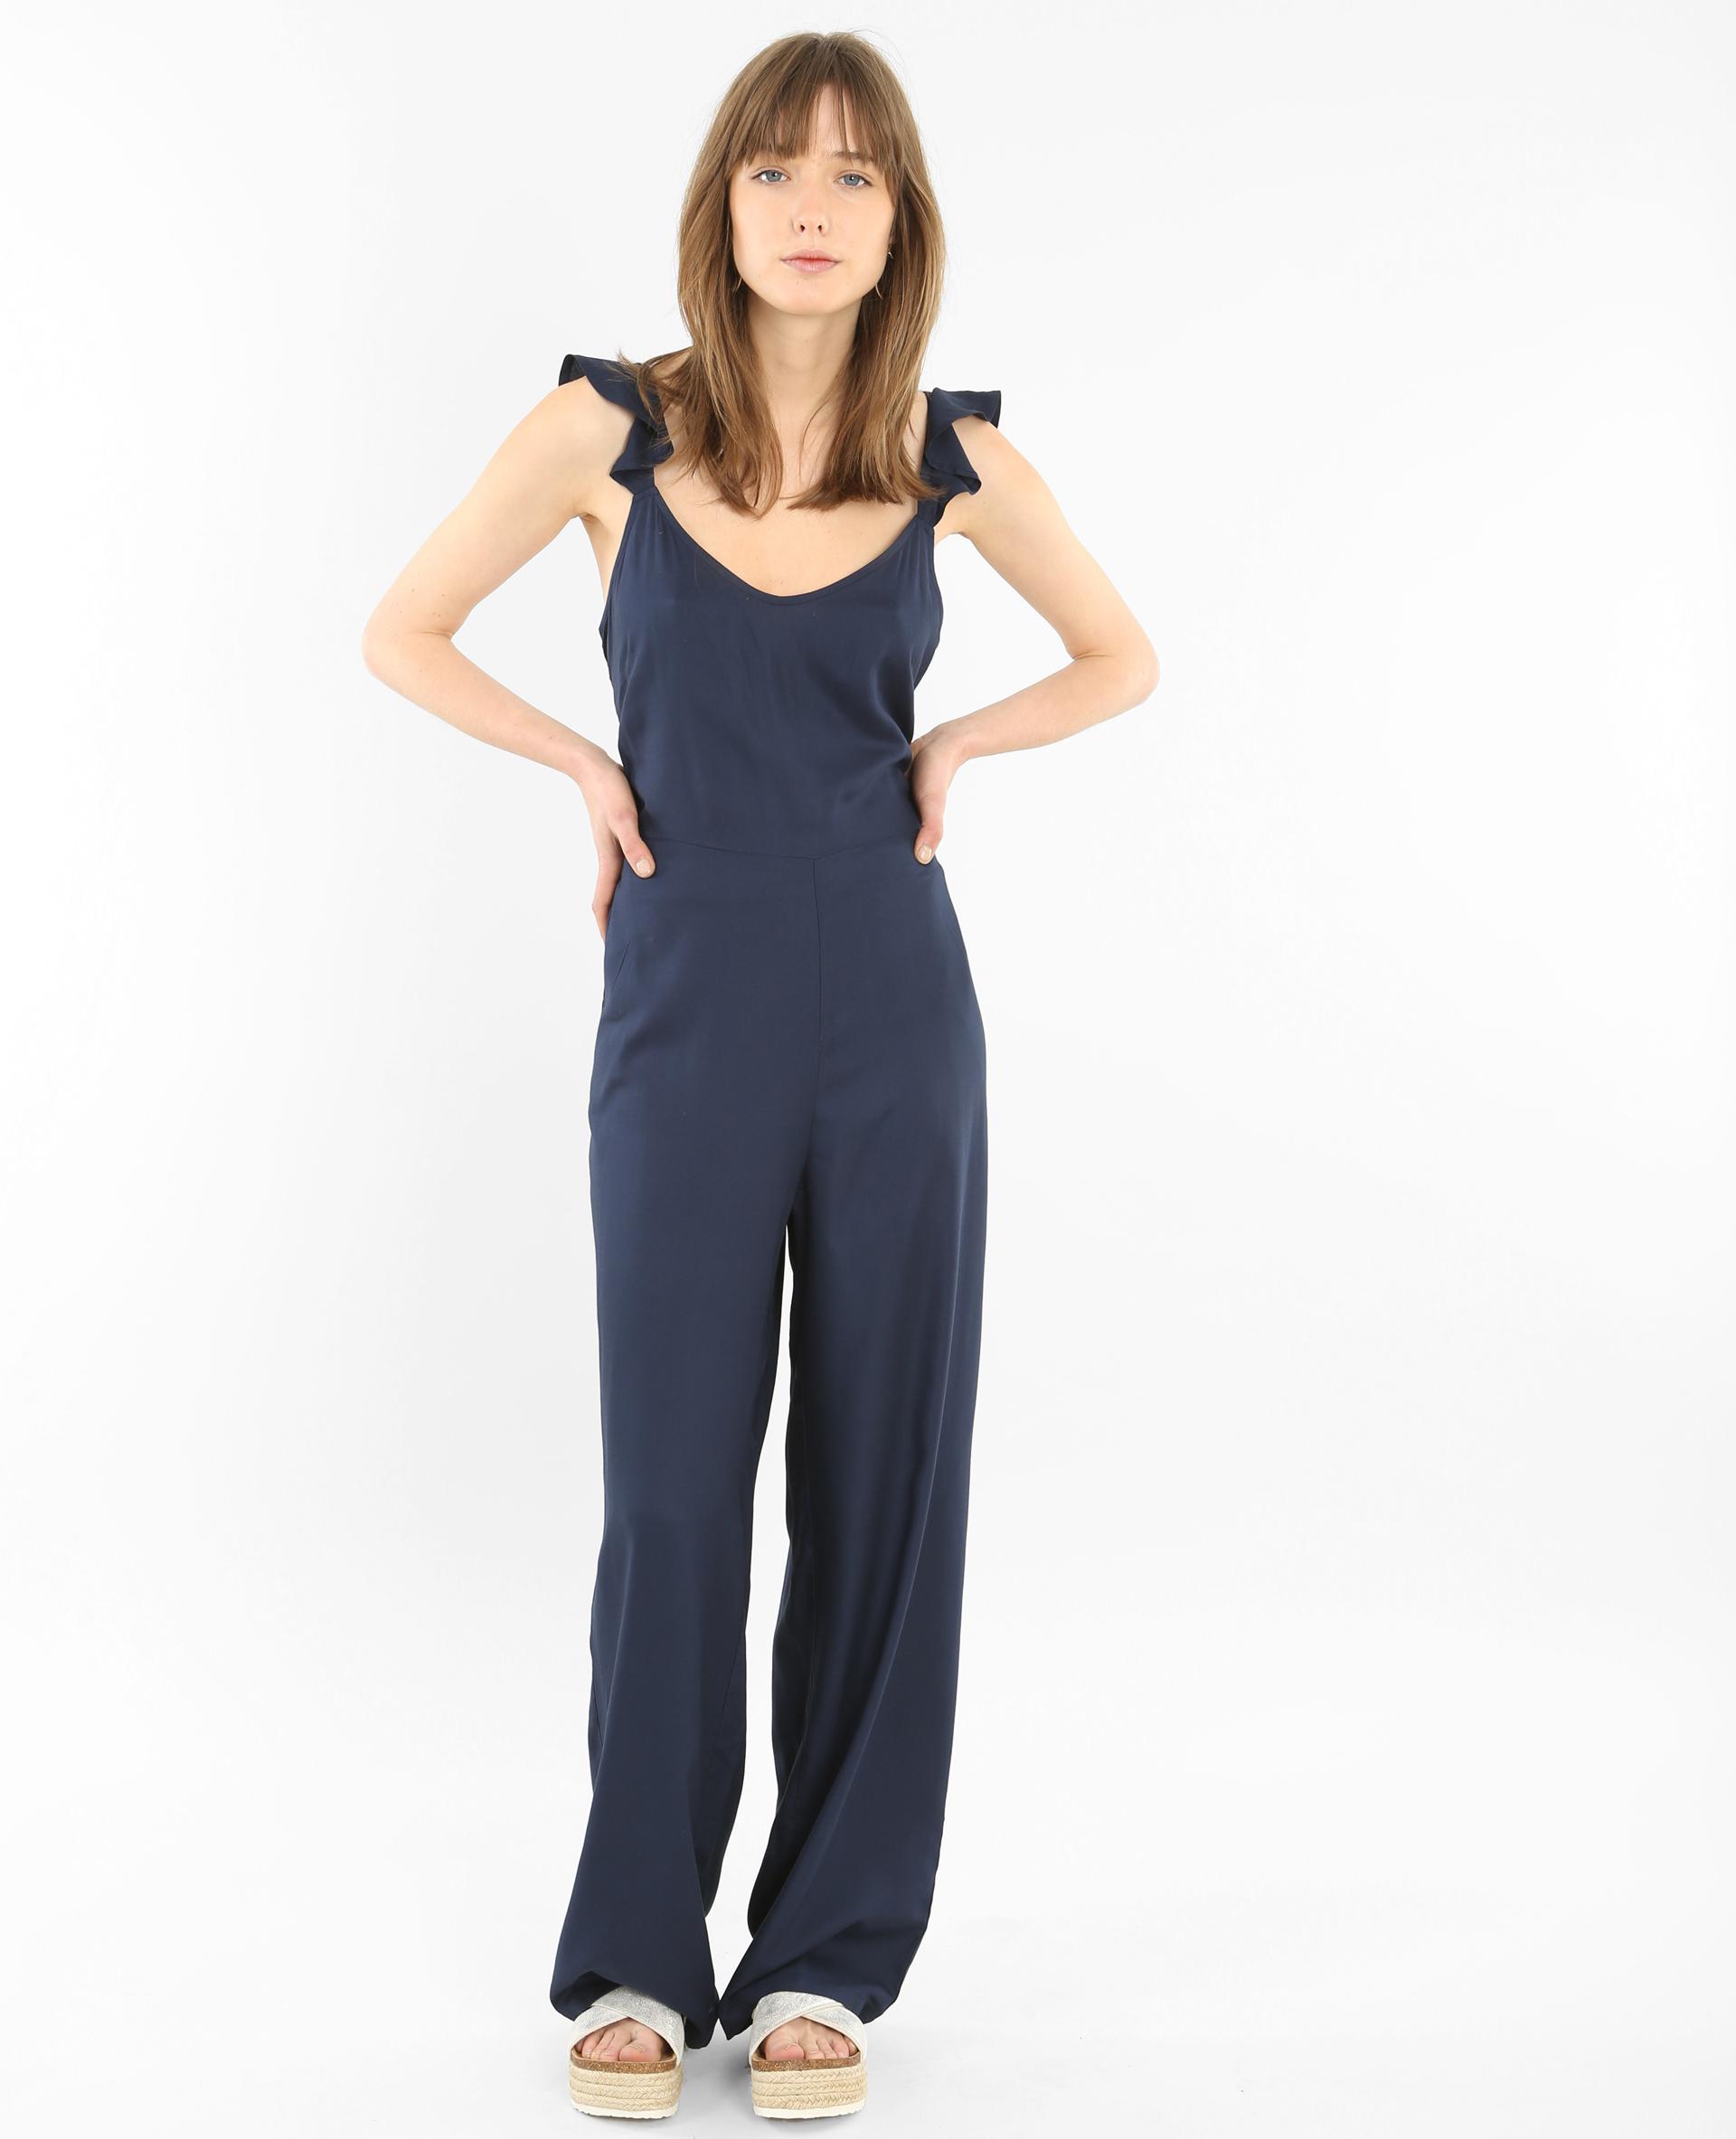 combi pantalon dos nu volant bleu marine 140269635a06 pimkie. Black Bedroom Furniture Sets. Home Design Ideas